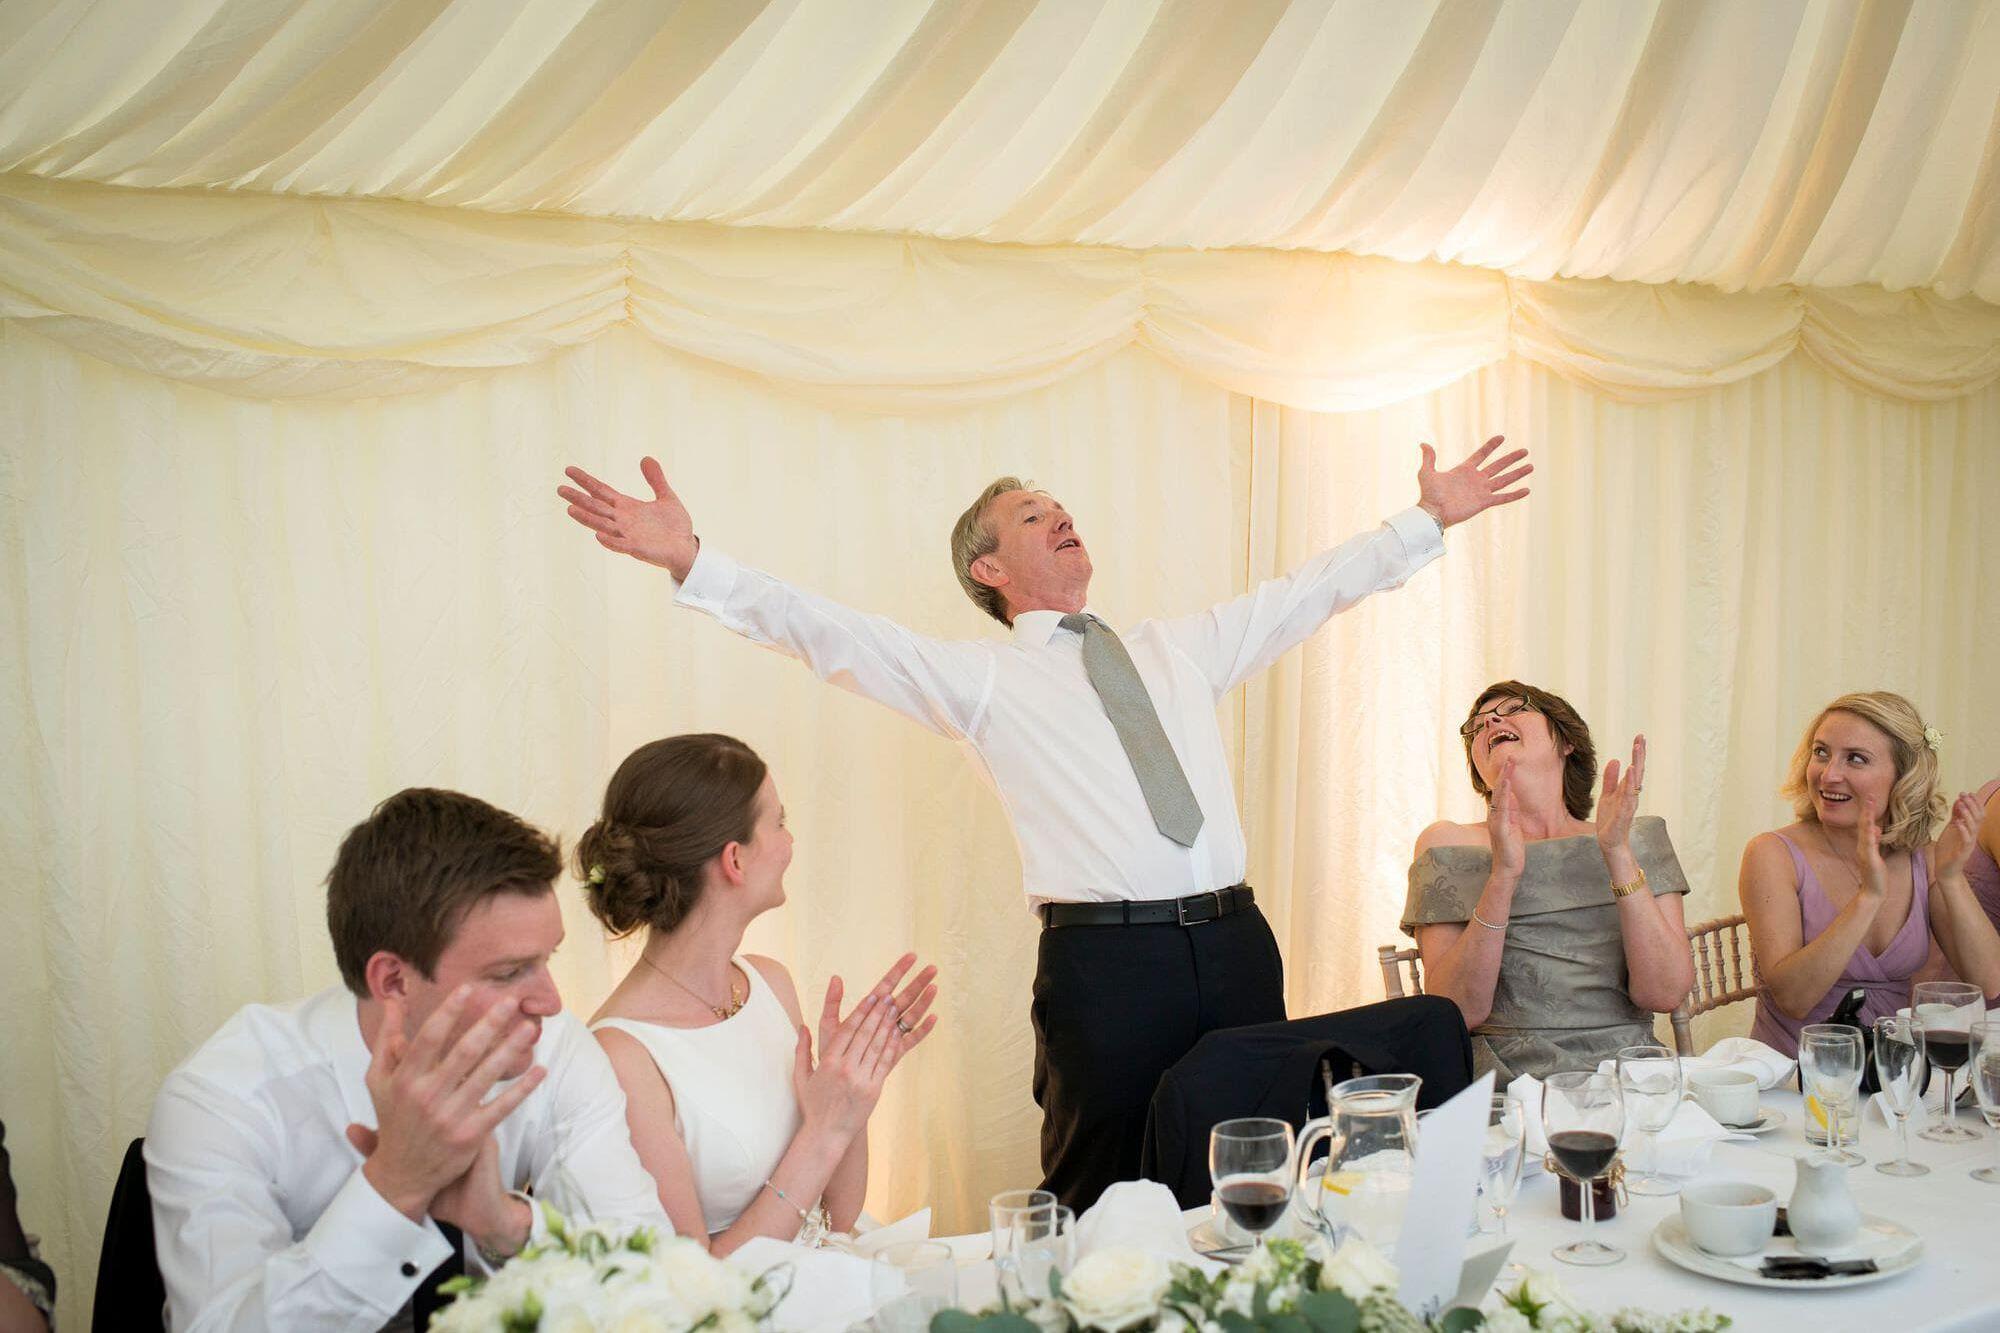 Mark-Seymour-Wedding-Photographer-UK-25 30